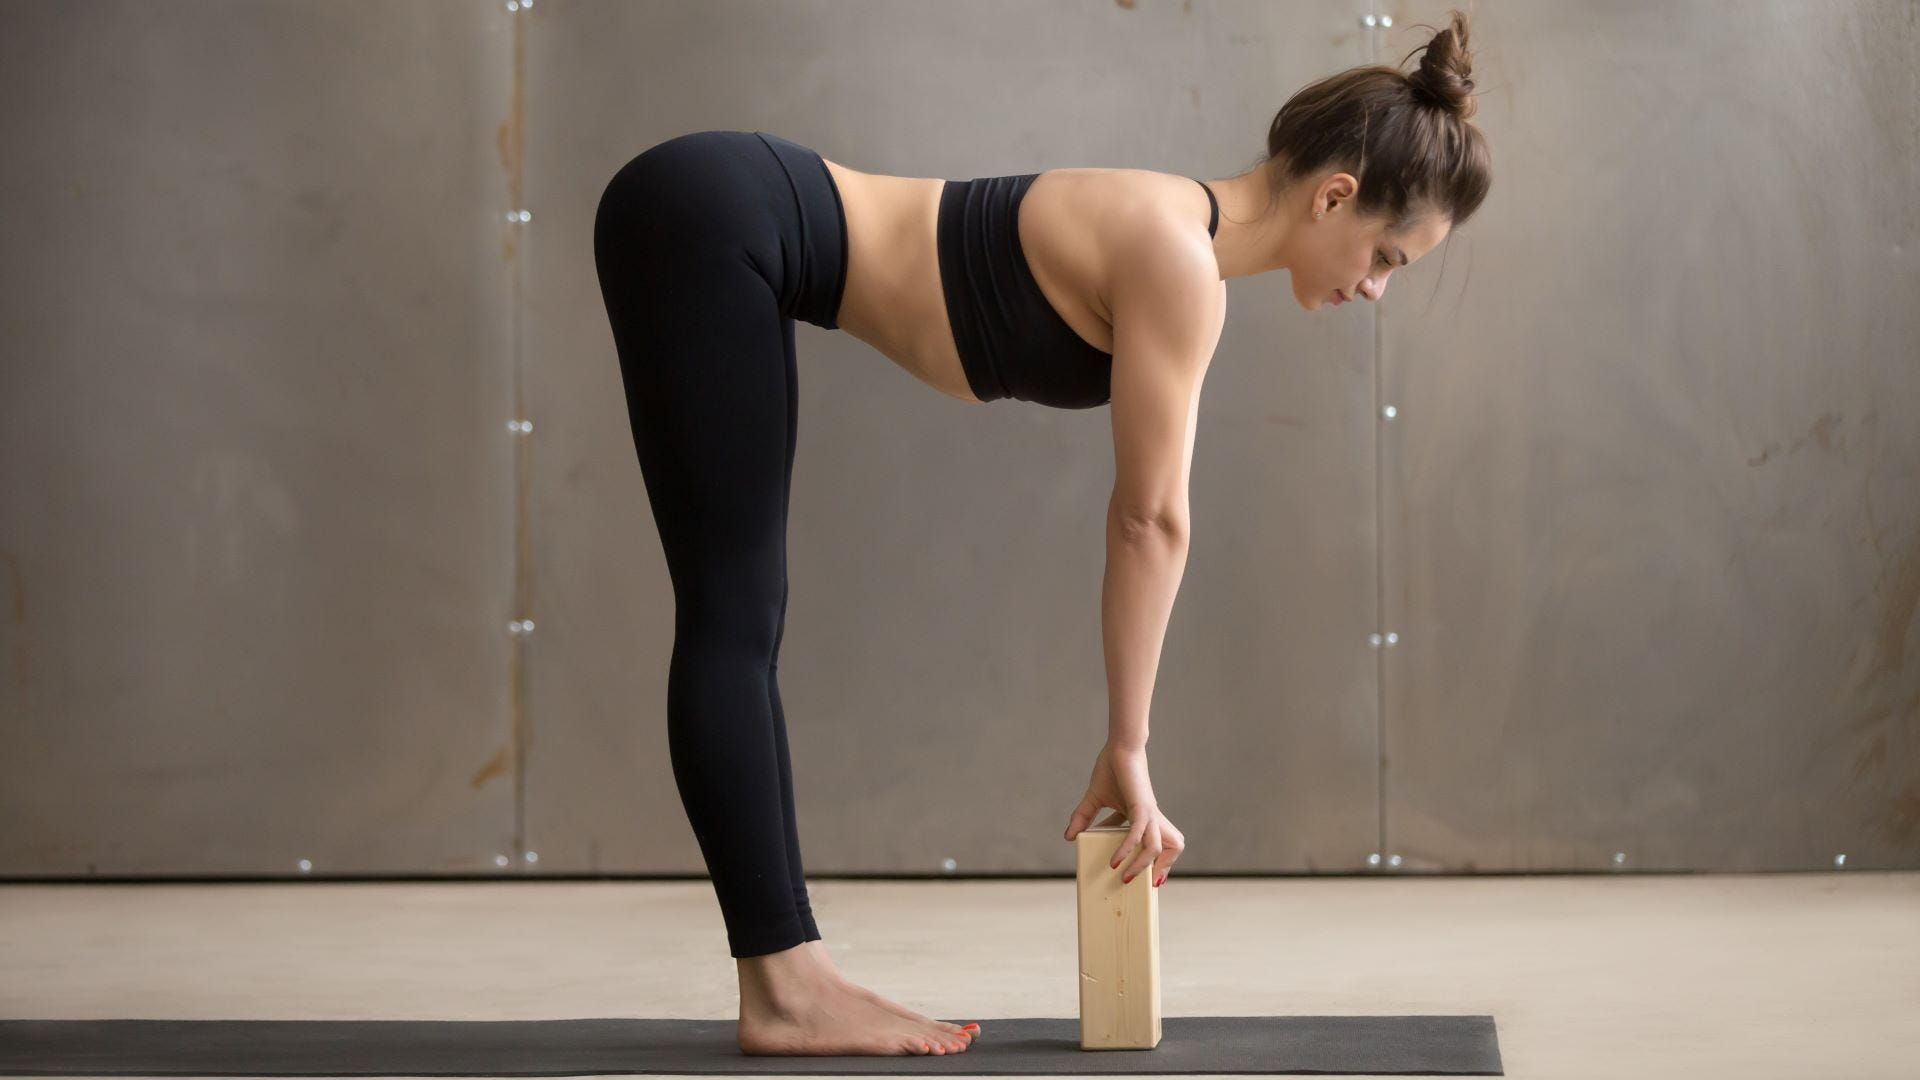 A woman doing a forward fold yoga pose with a yoga brick.